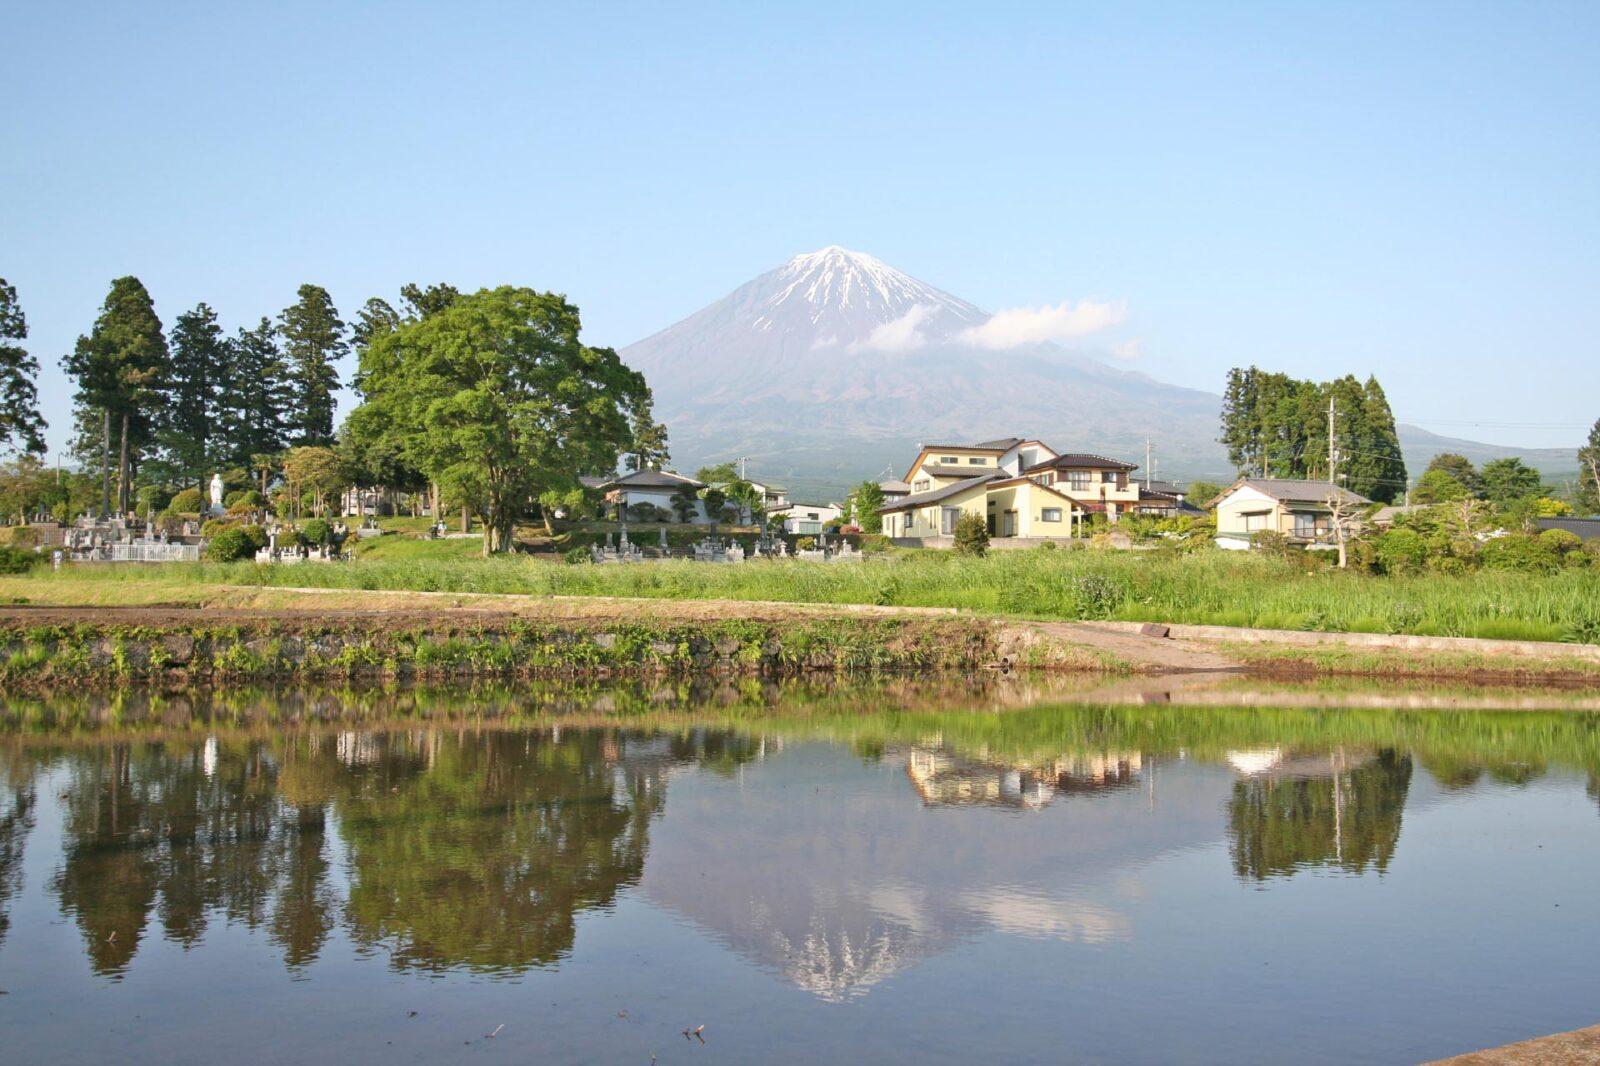 初夏の富士山